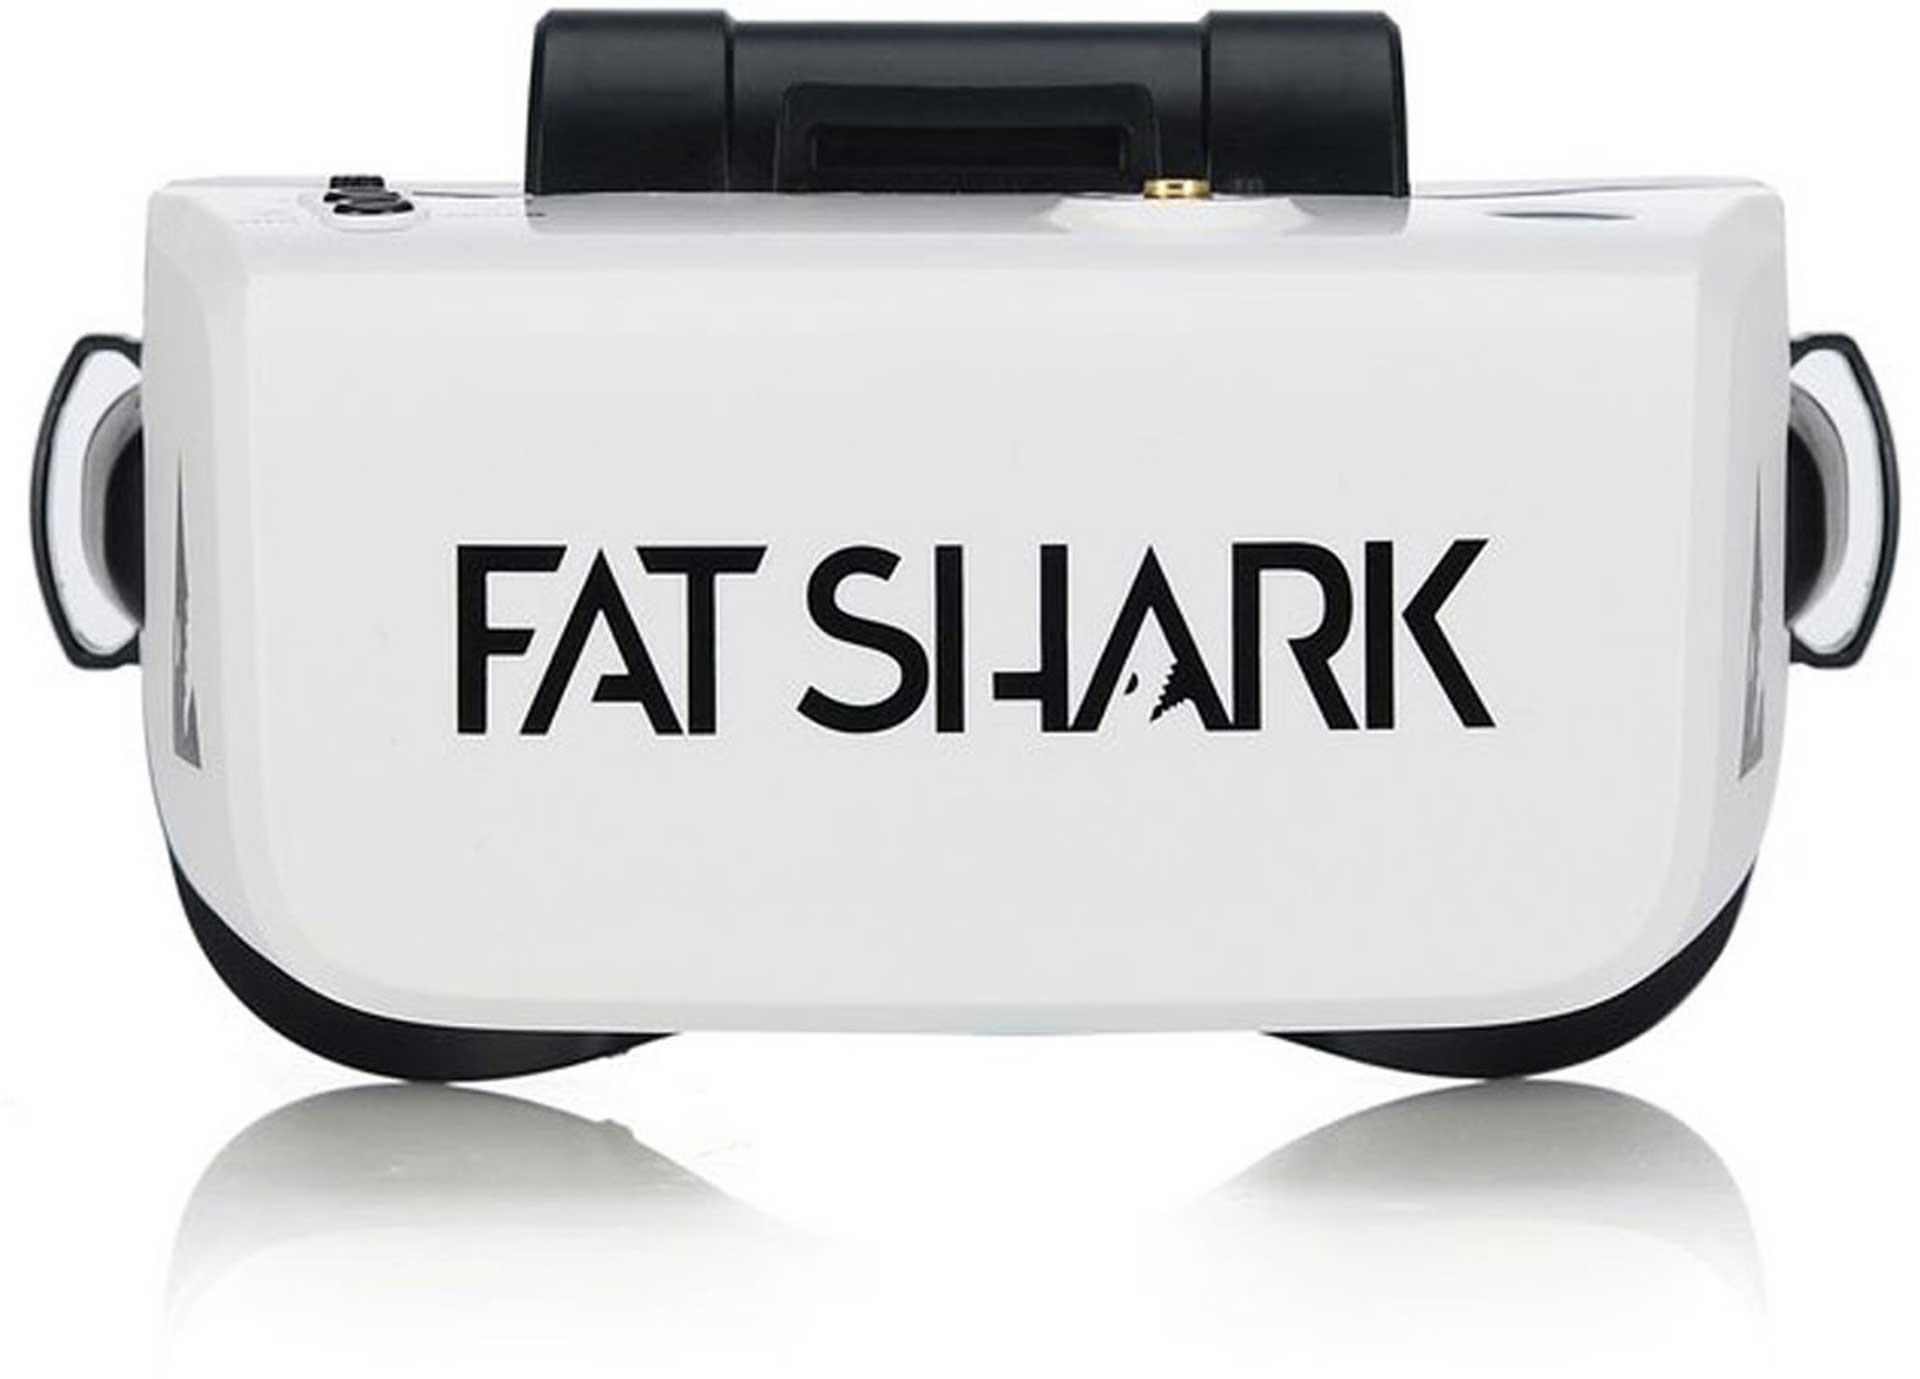 FAT SHARK SCOUT GOGGLES 1136 X 640